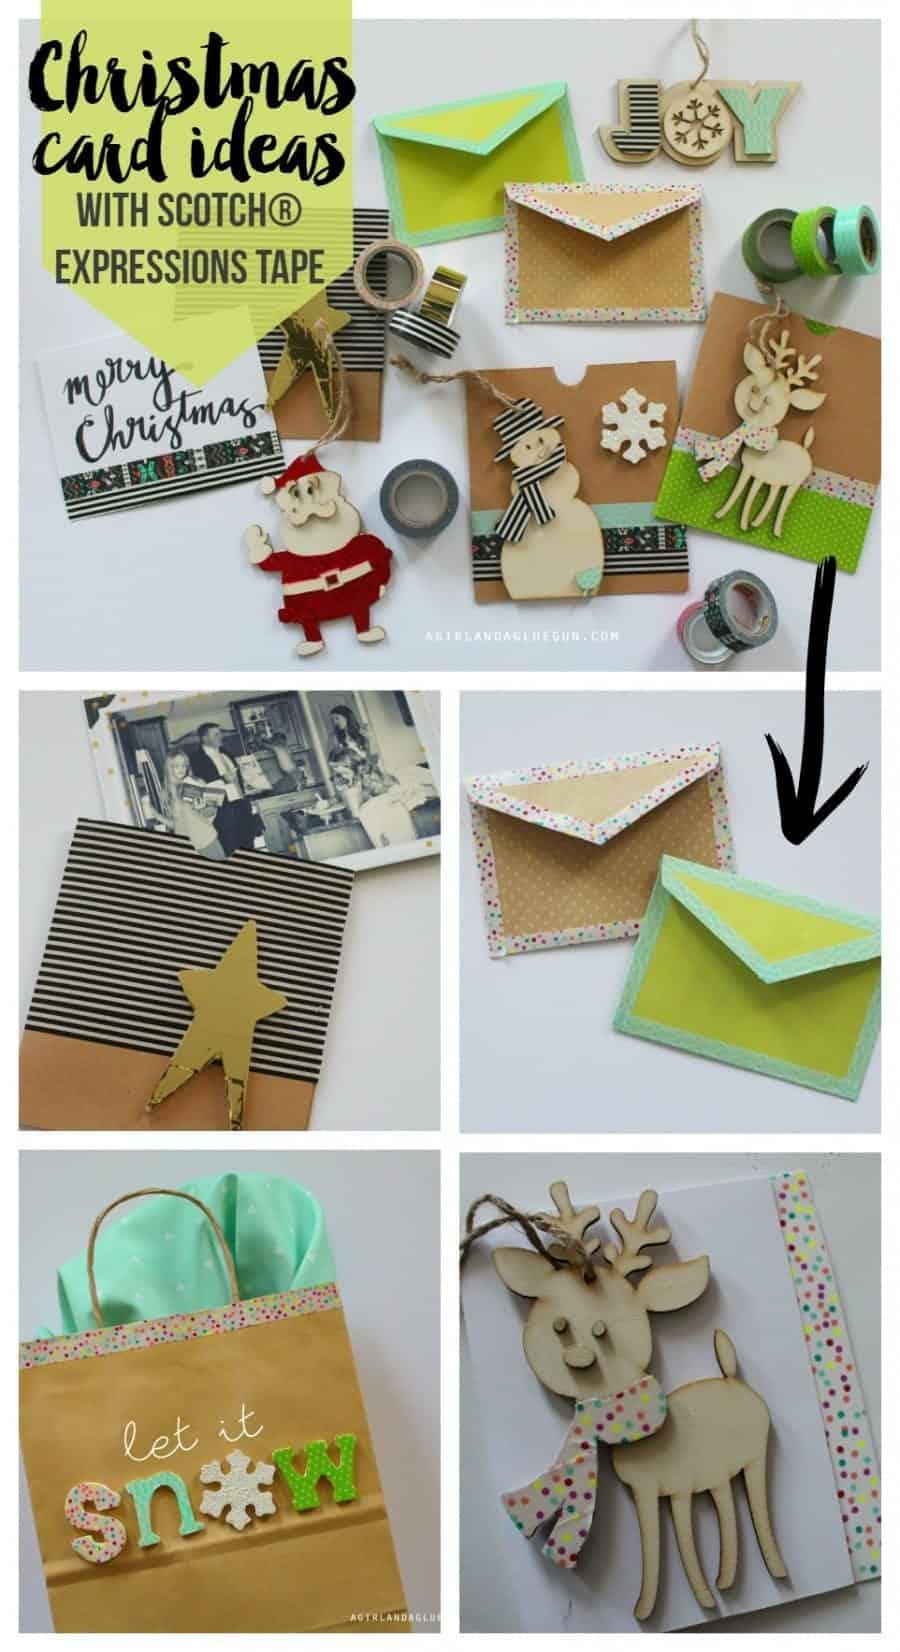 christmas card ideas with scotch